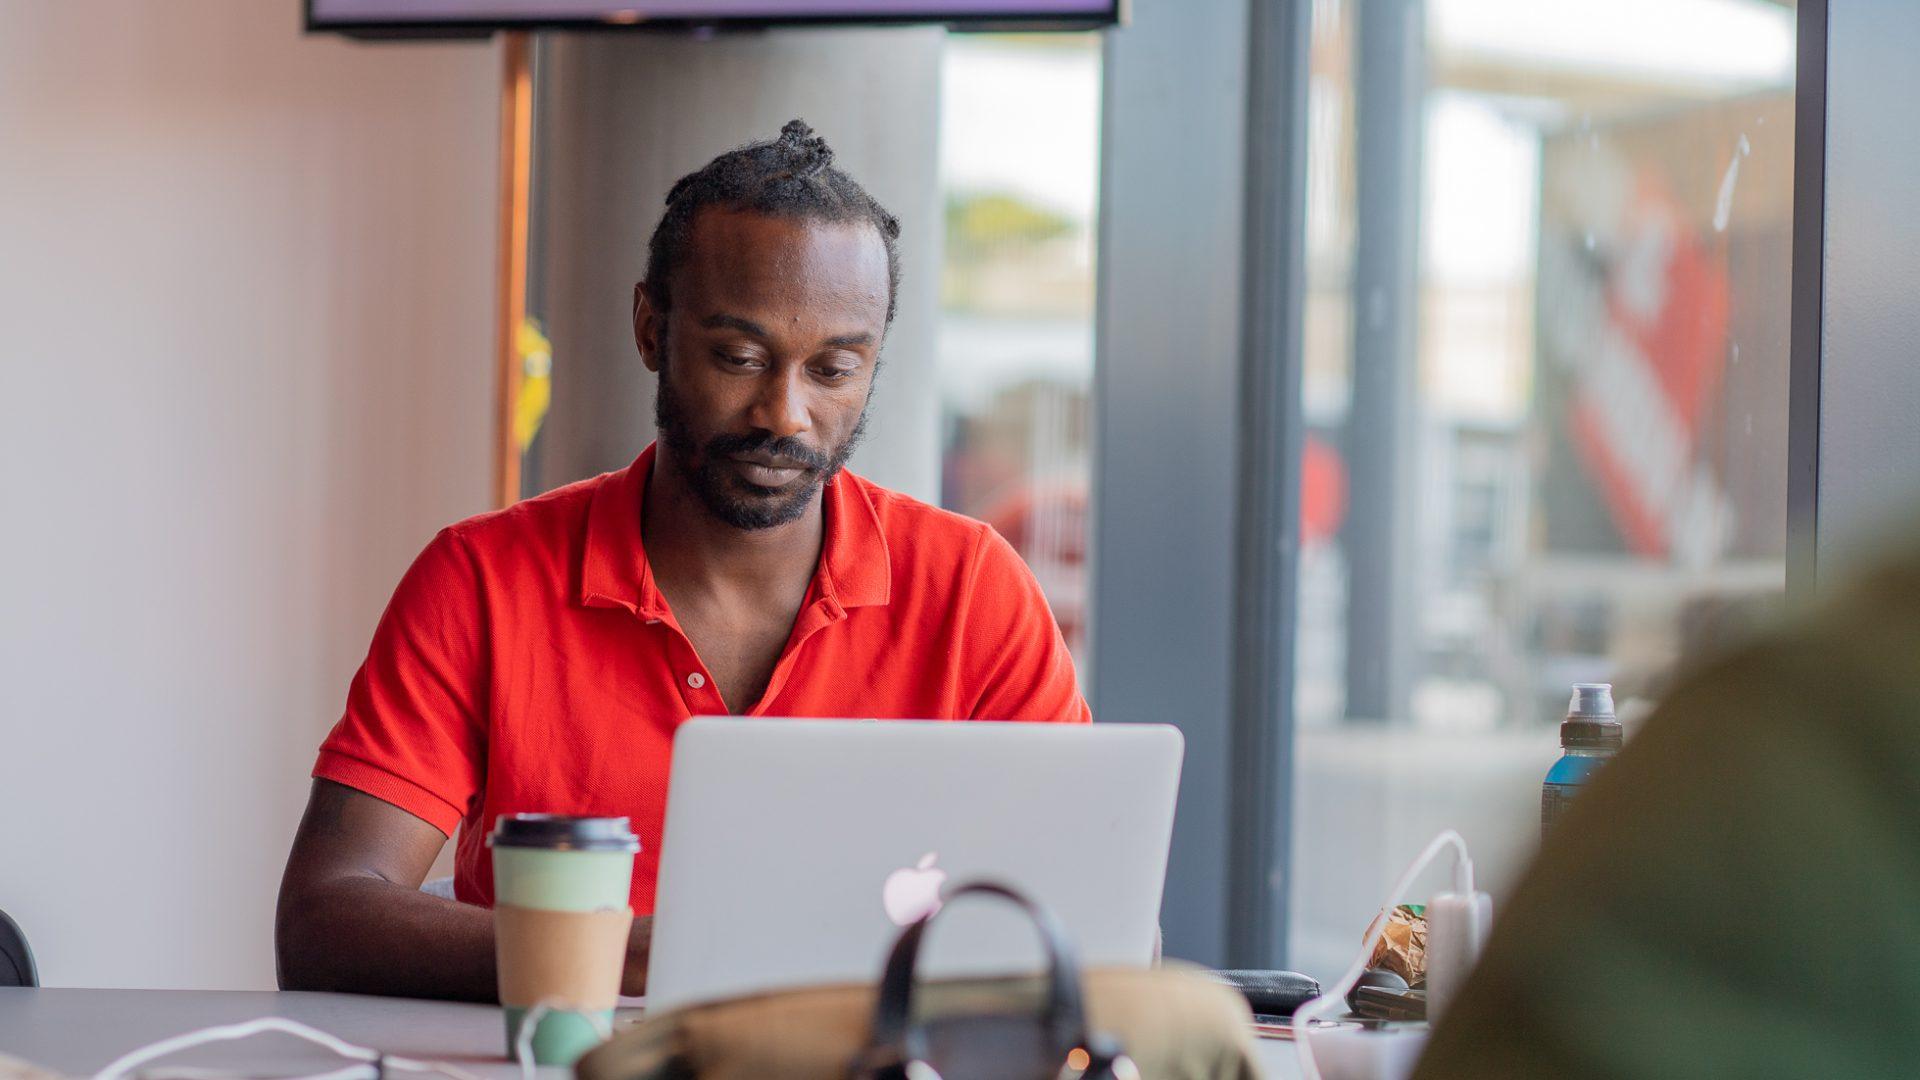 En man sitter i ett coworkingspace med en bärbar dator och en takeawaymugg kaffe